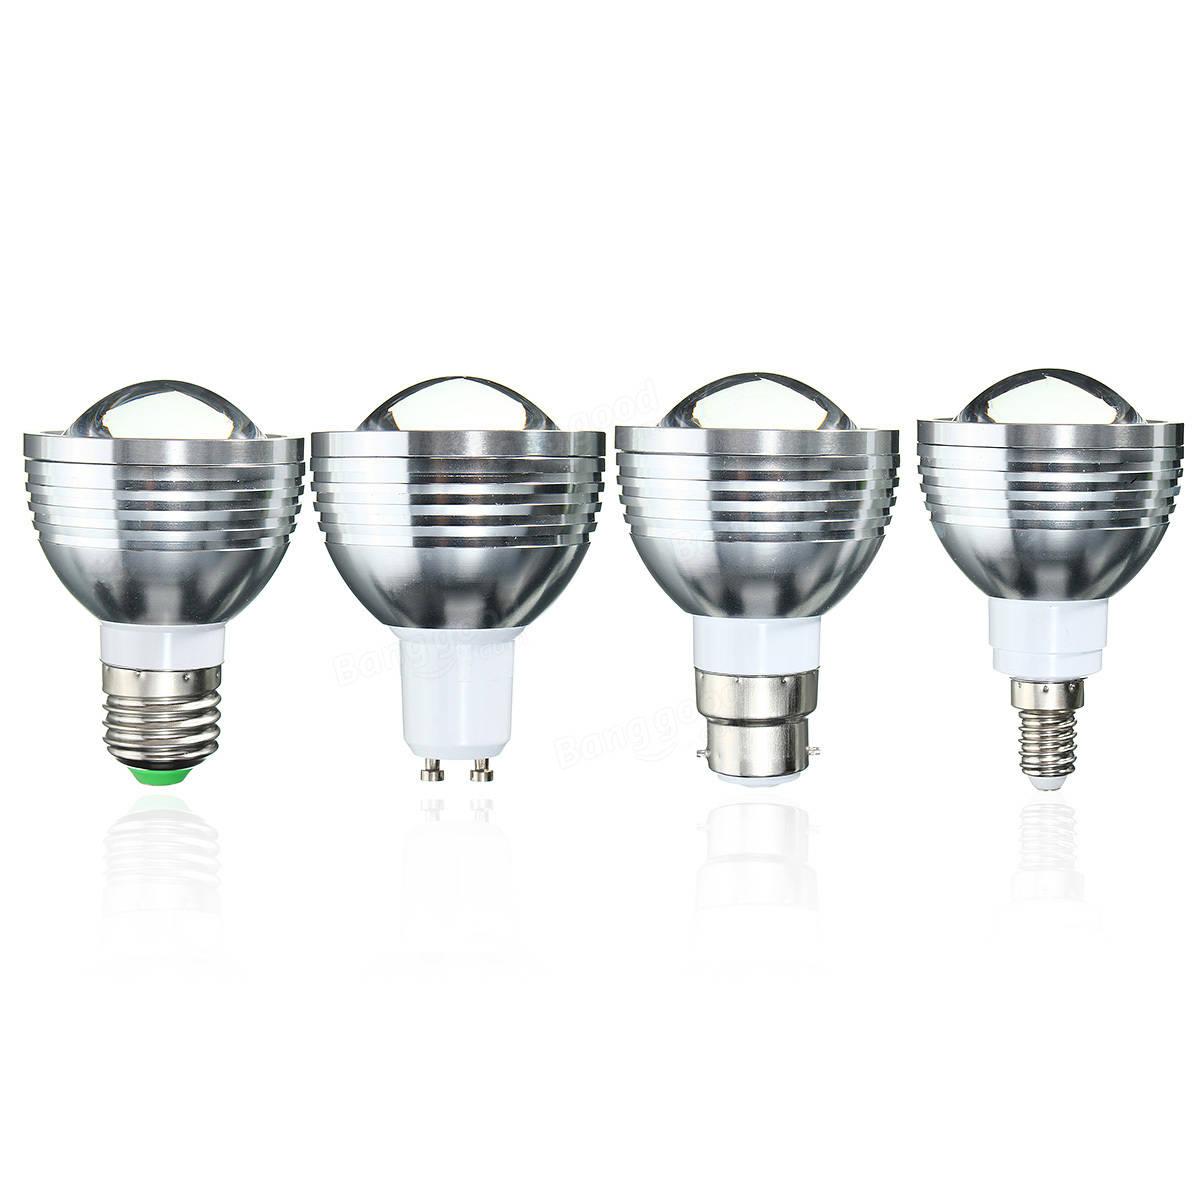 E27 B22 Gu10 E14 5w Dimmable Rgb Color Changing Led Spot Light Lamp Bulb Remote Ac 85 265v